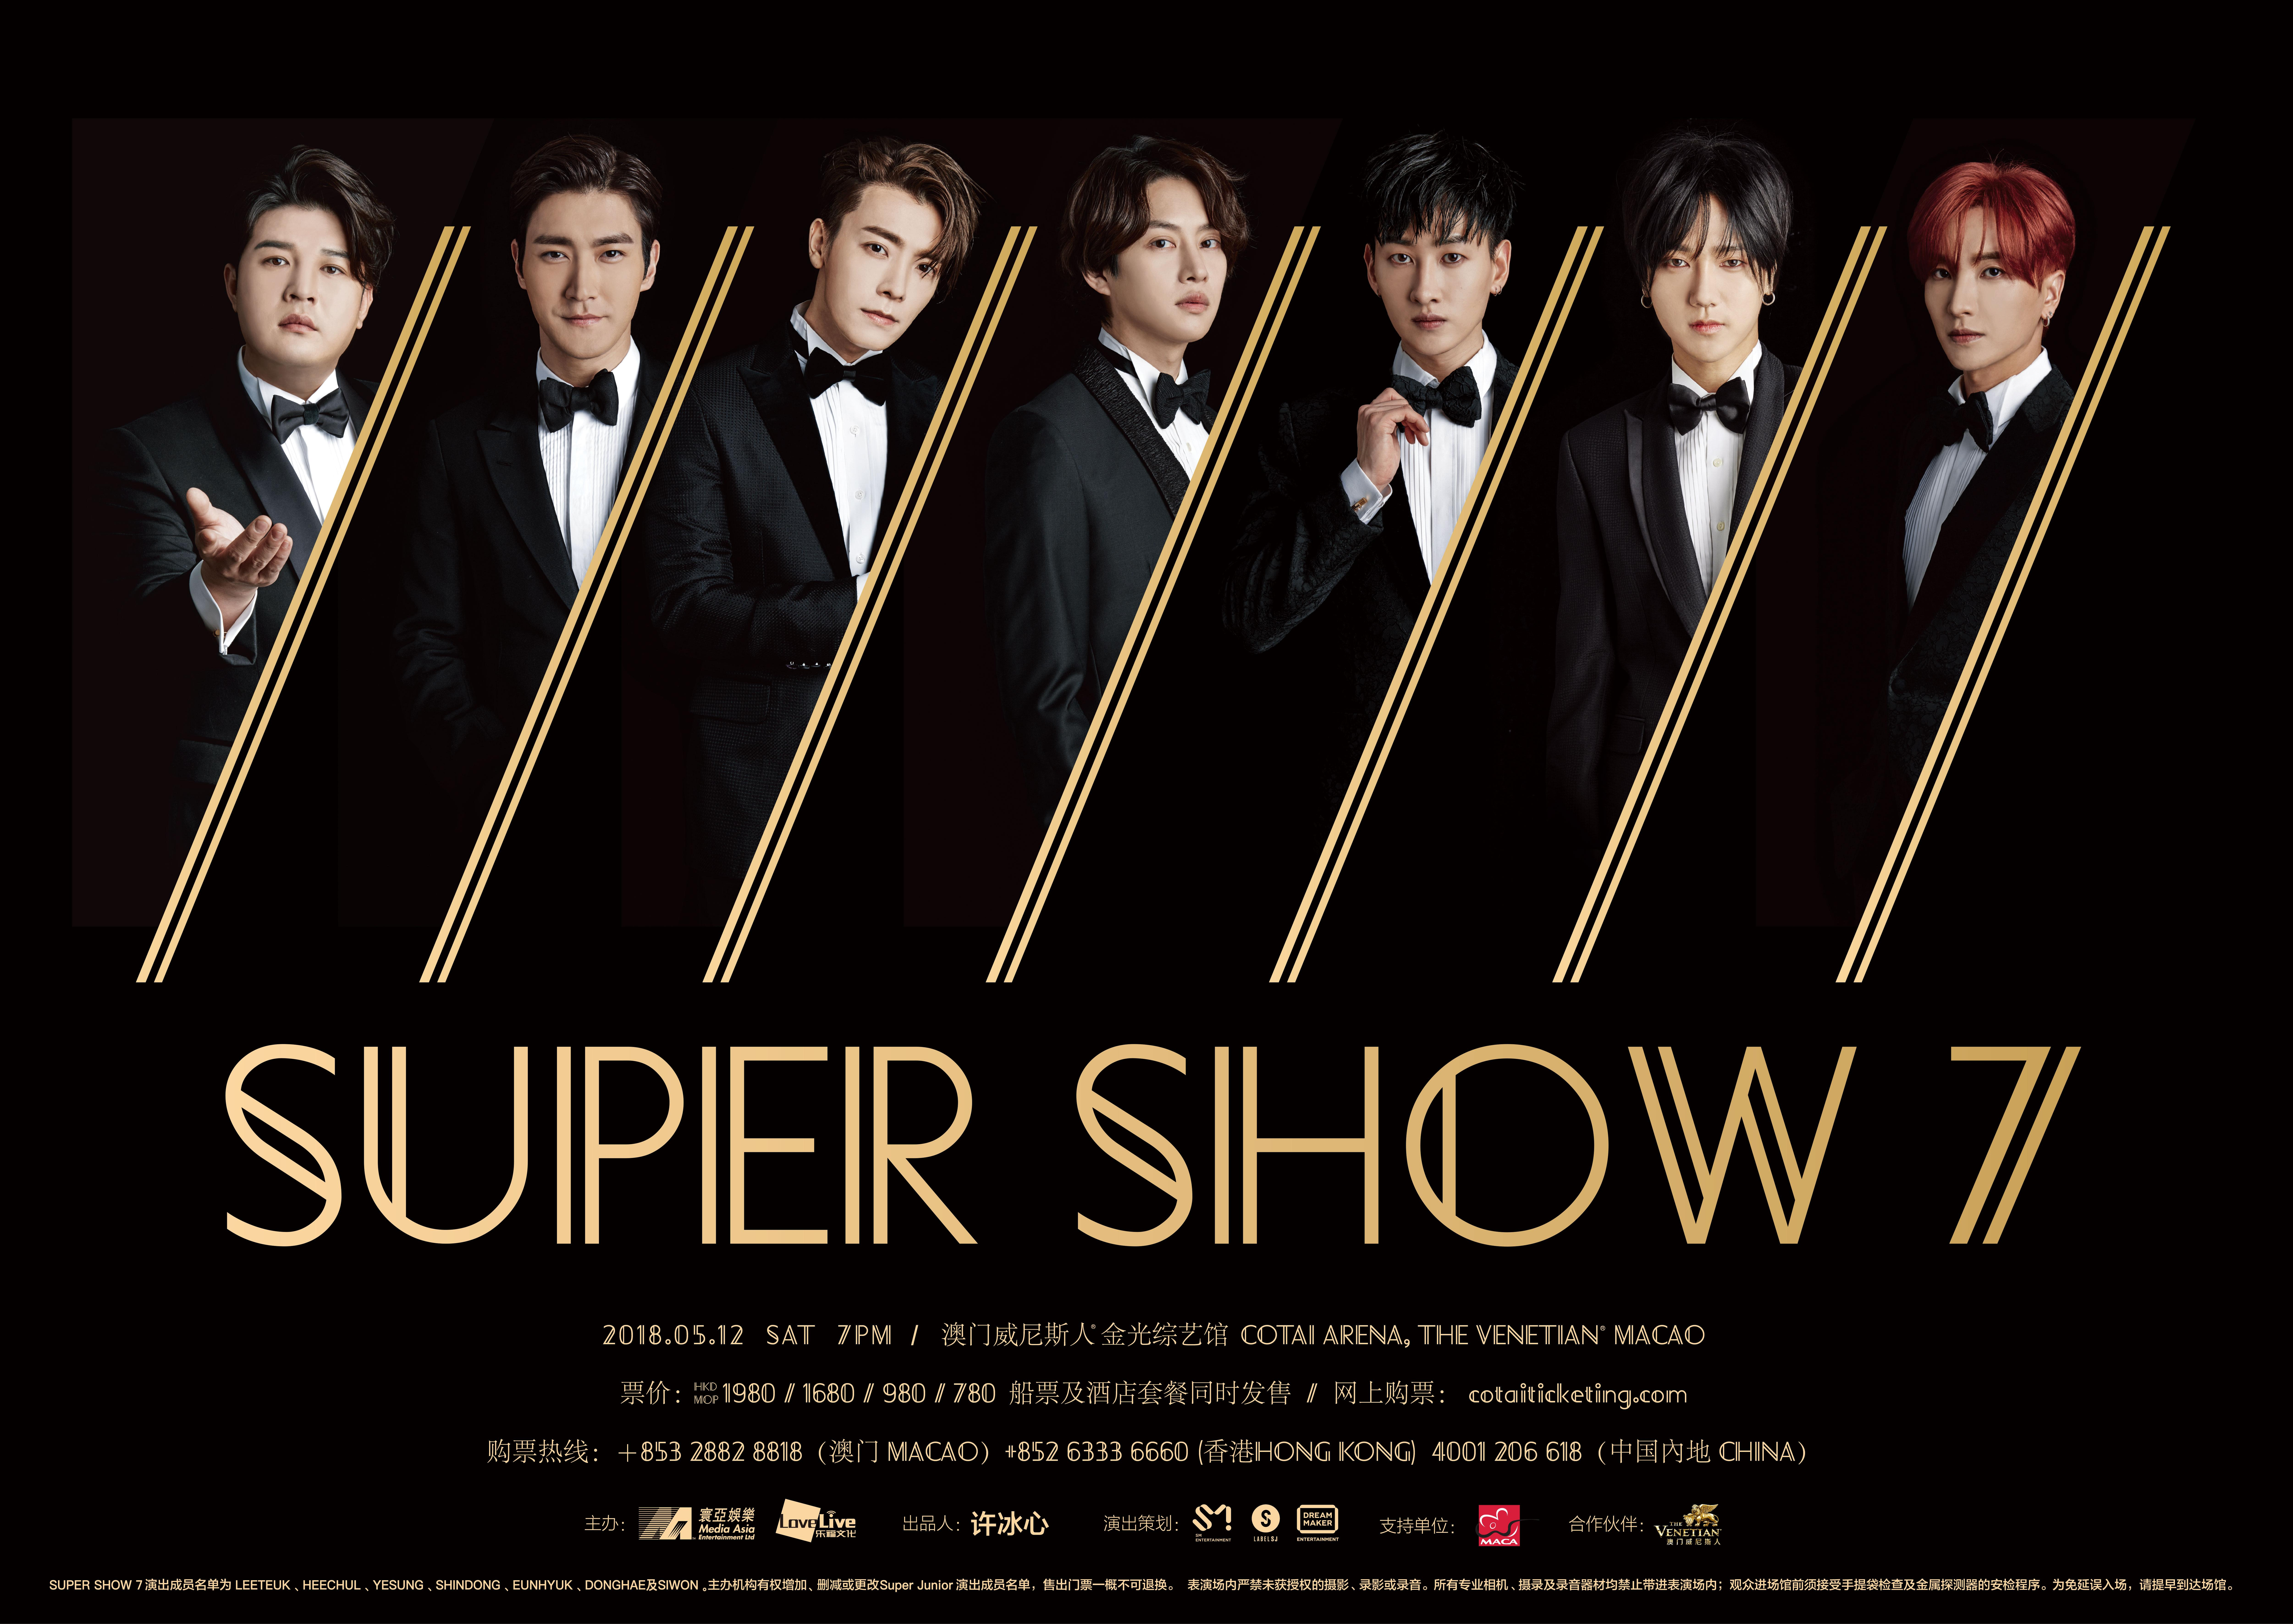 《SUPER JUNIOR WORLD TOUR 'SUPER SHOW 7' IN MACAO》澳门威尼斯人金光综艺馆